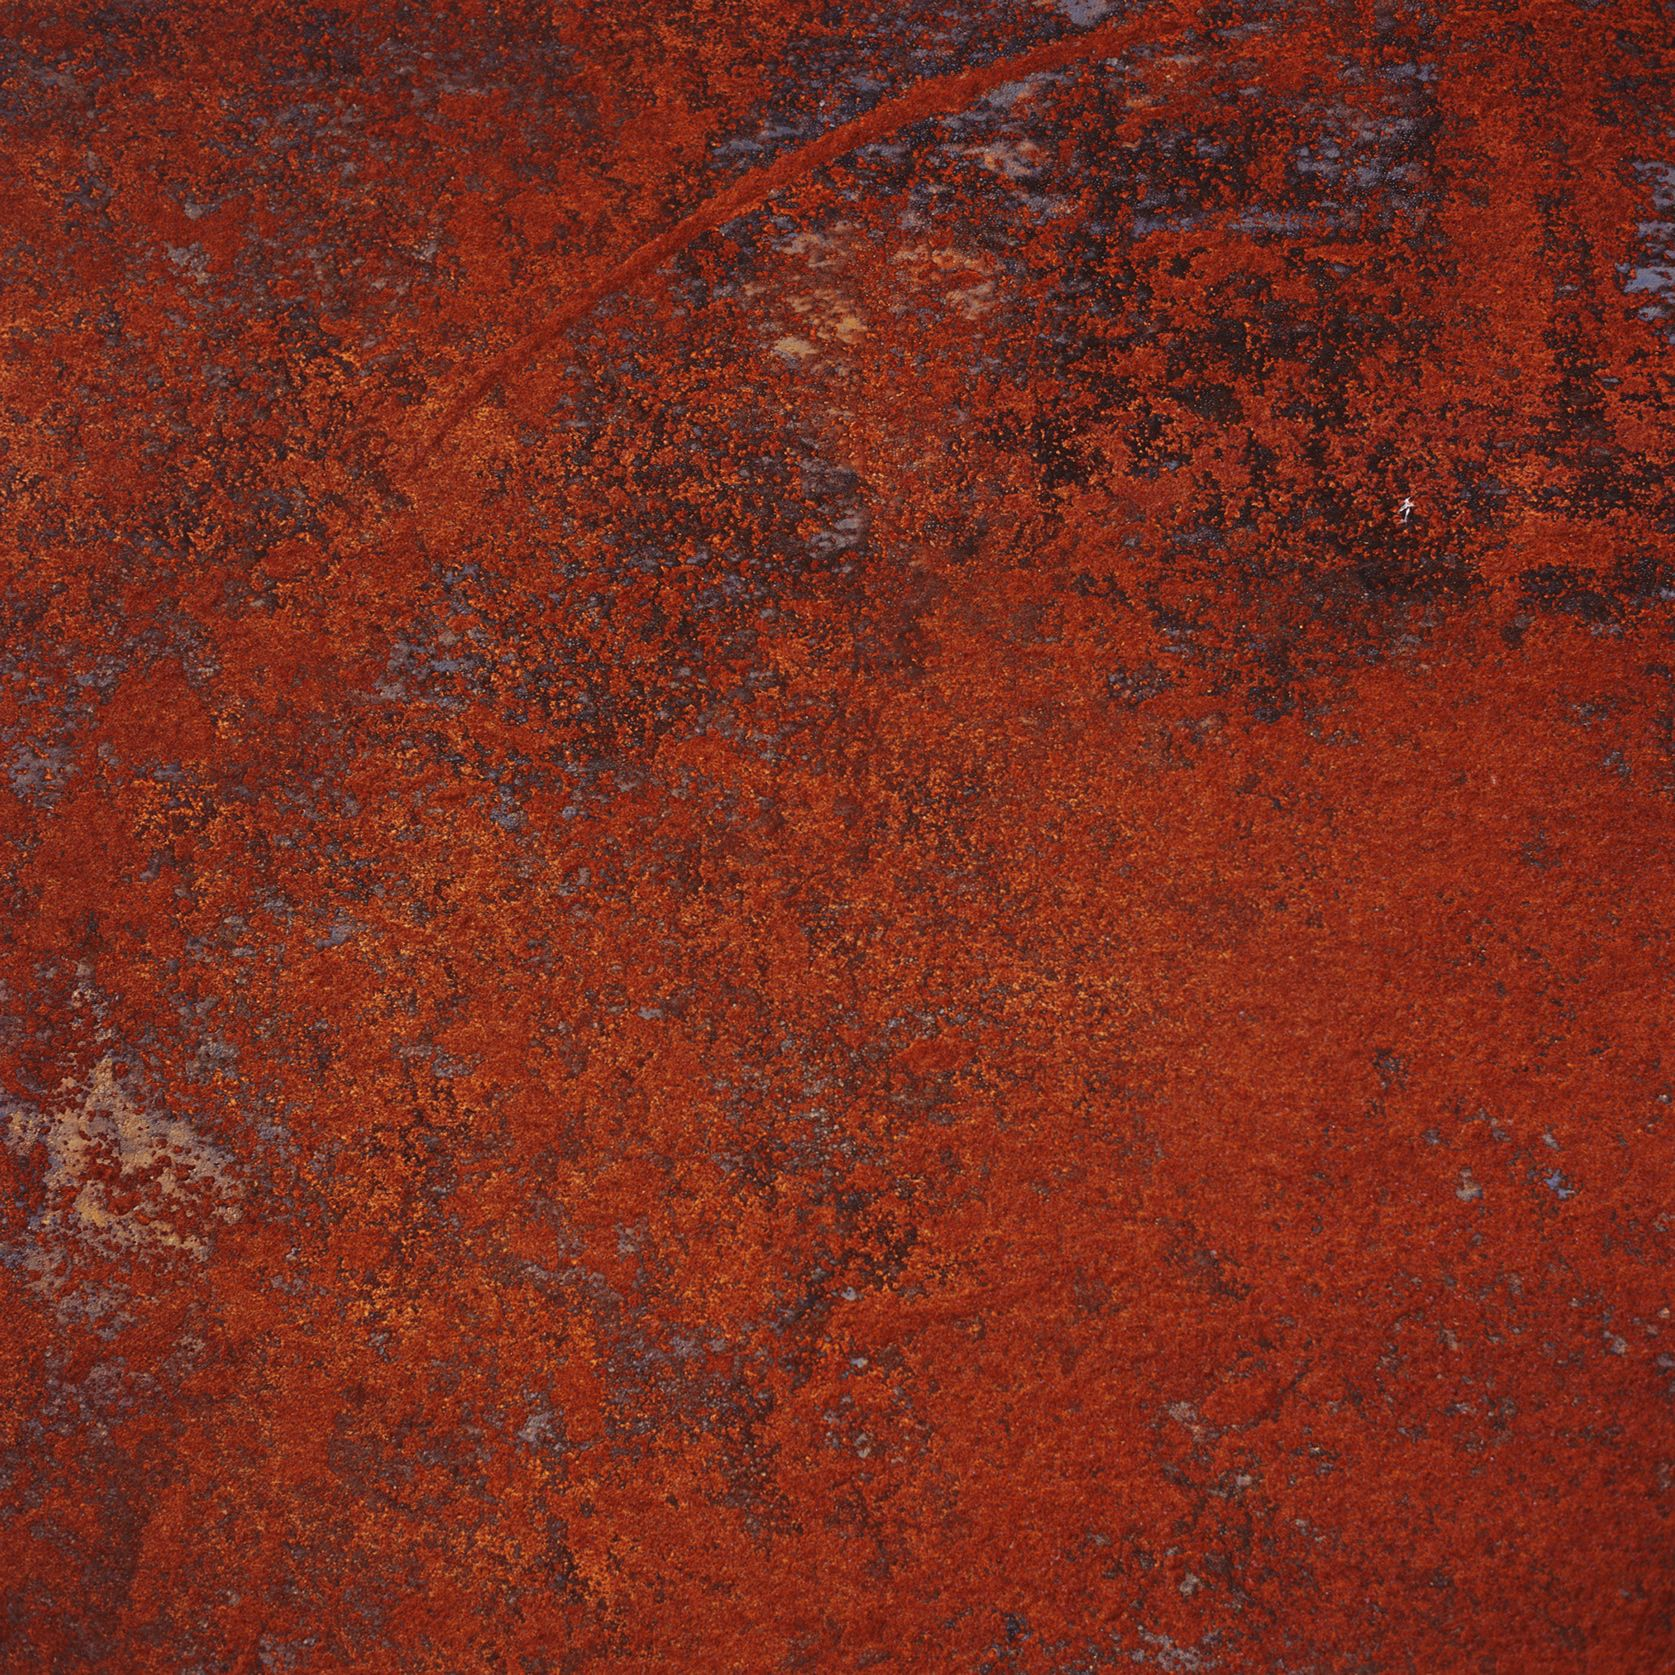 Beibehang Large Custom Wall Paper Cool Metal Texture: Rusted Metal Texture